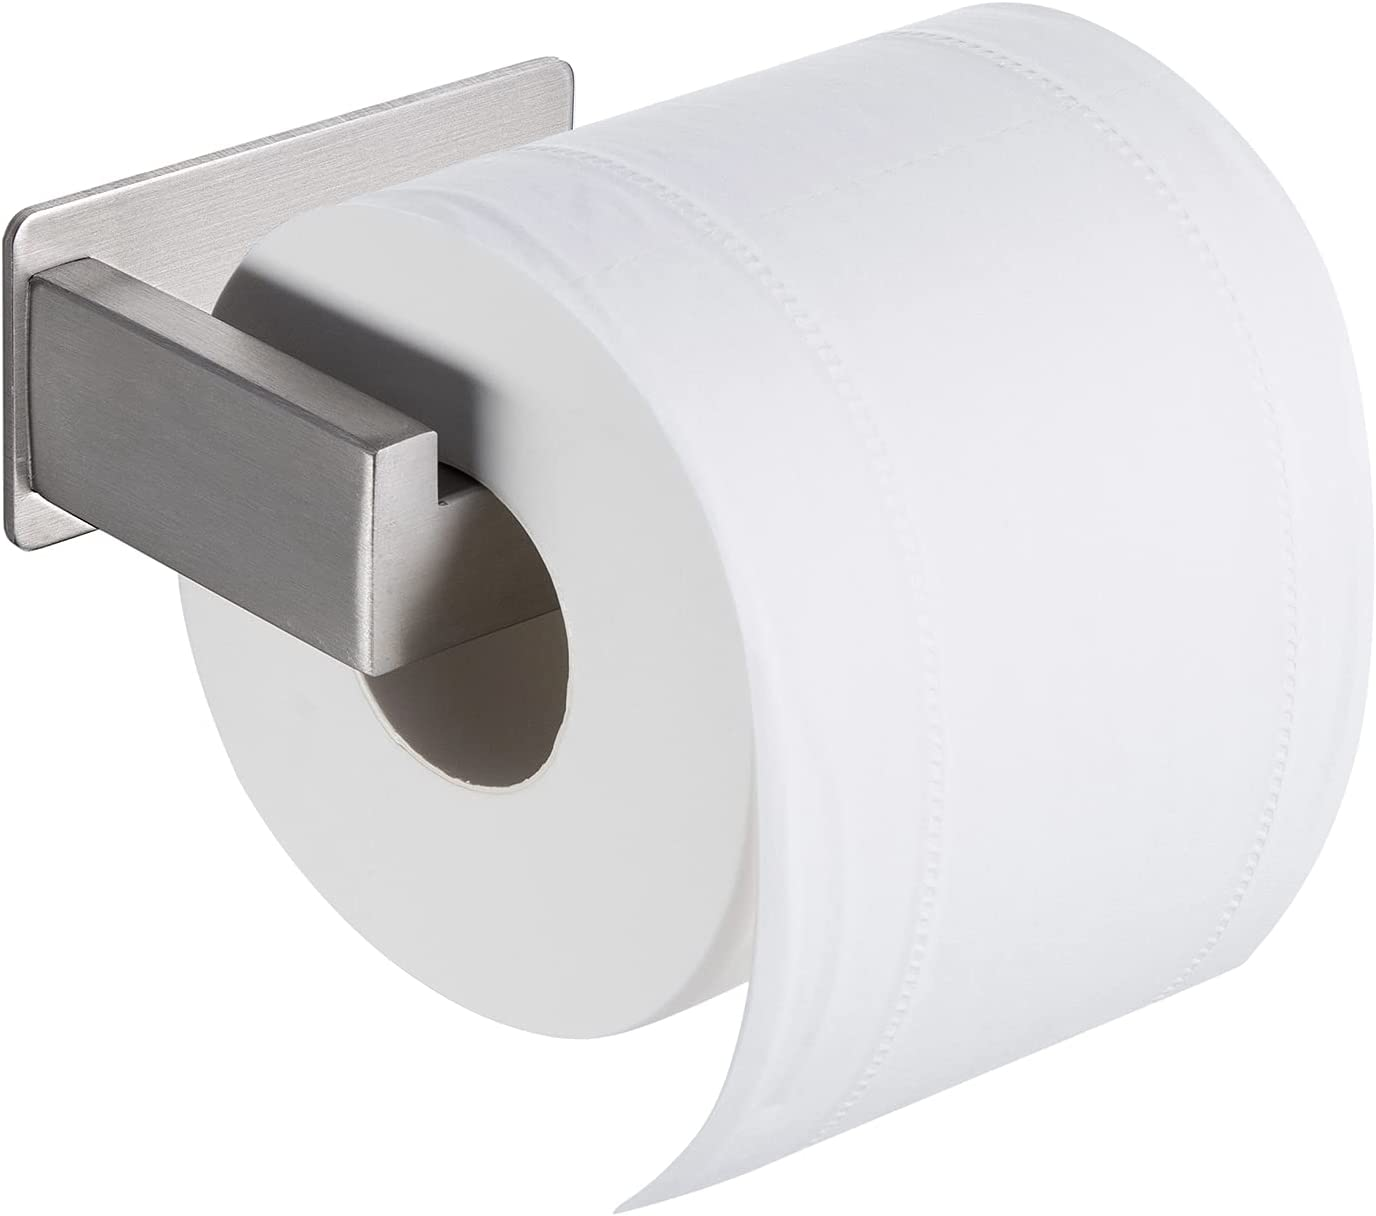 Kapitan Stick On Toilet Roll Holder Stainless Steel Paper Holder Self Adhesi...